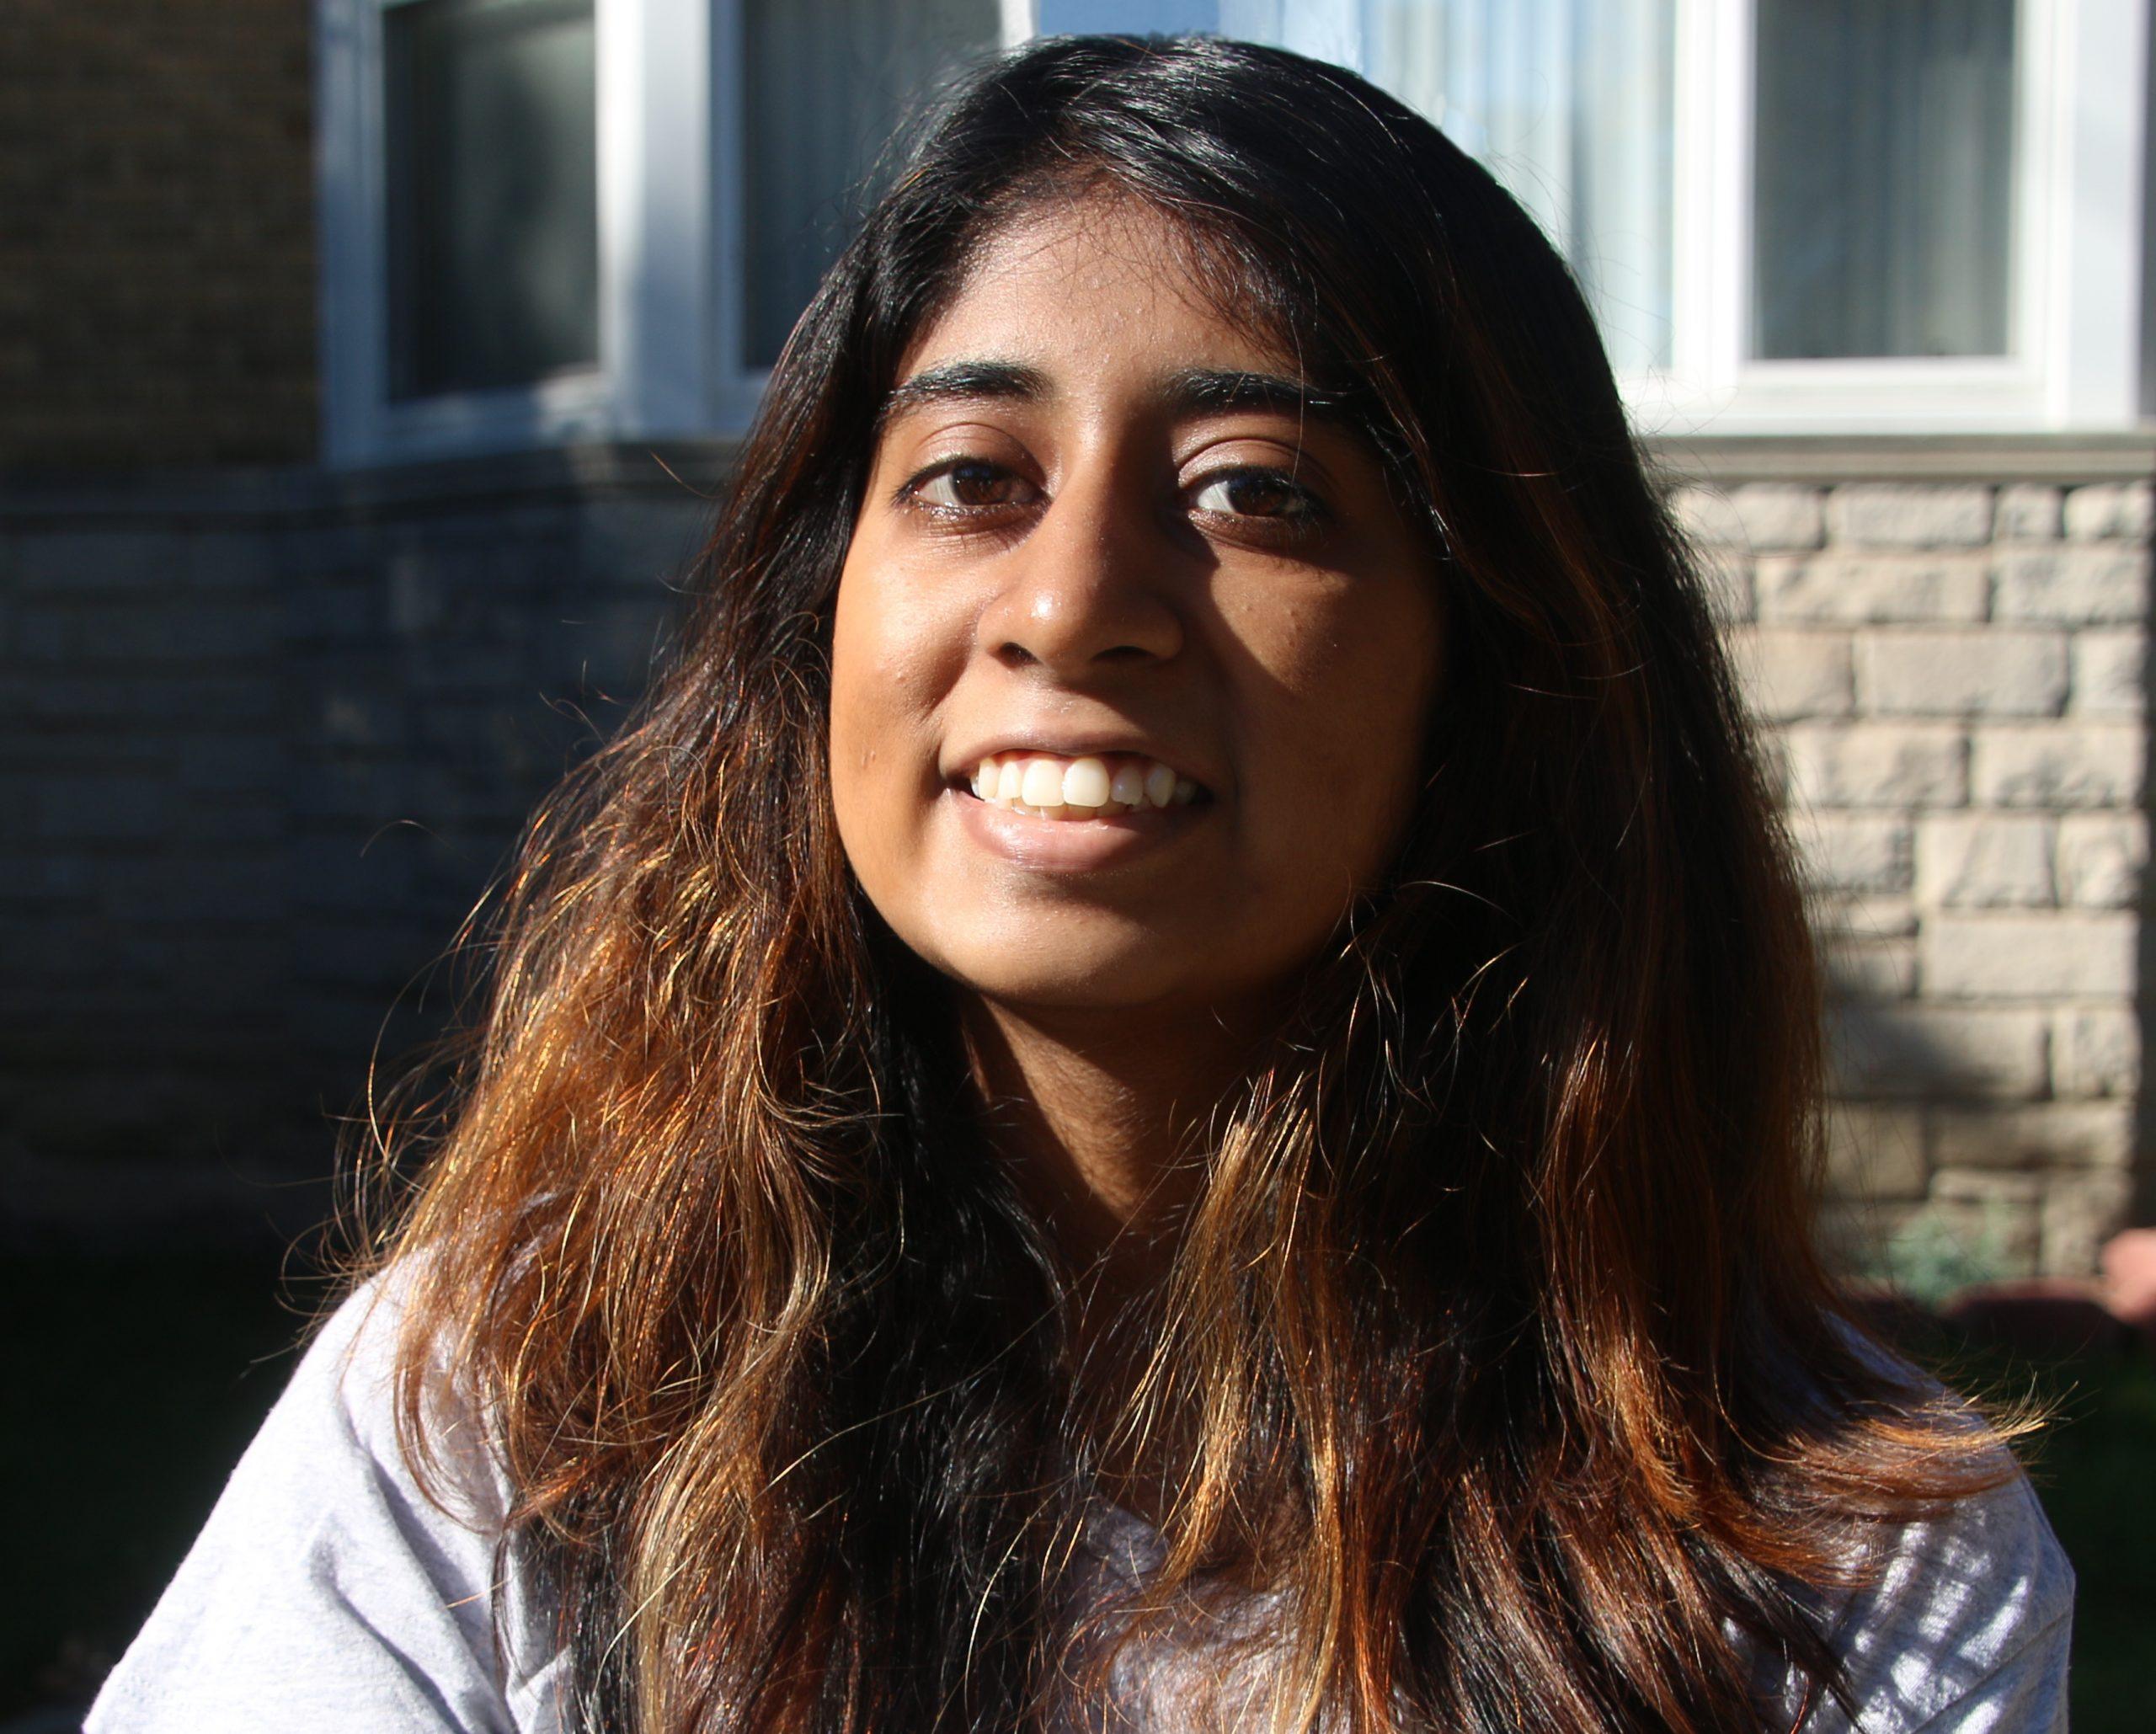 Pooja Patel, 17